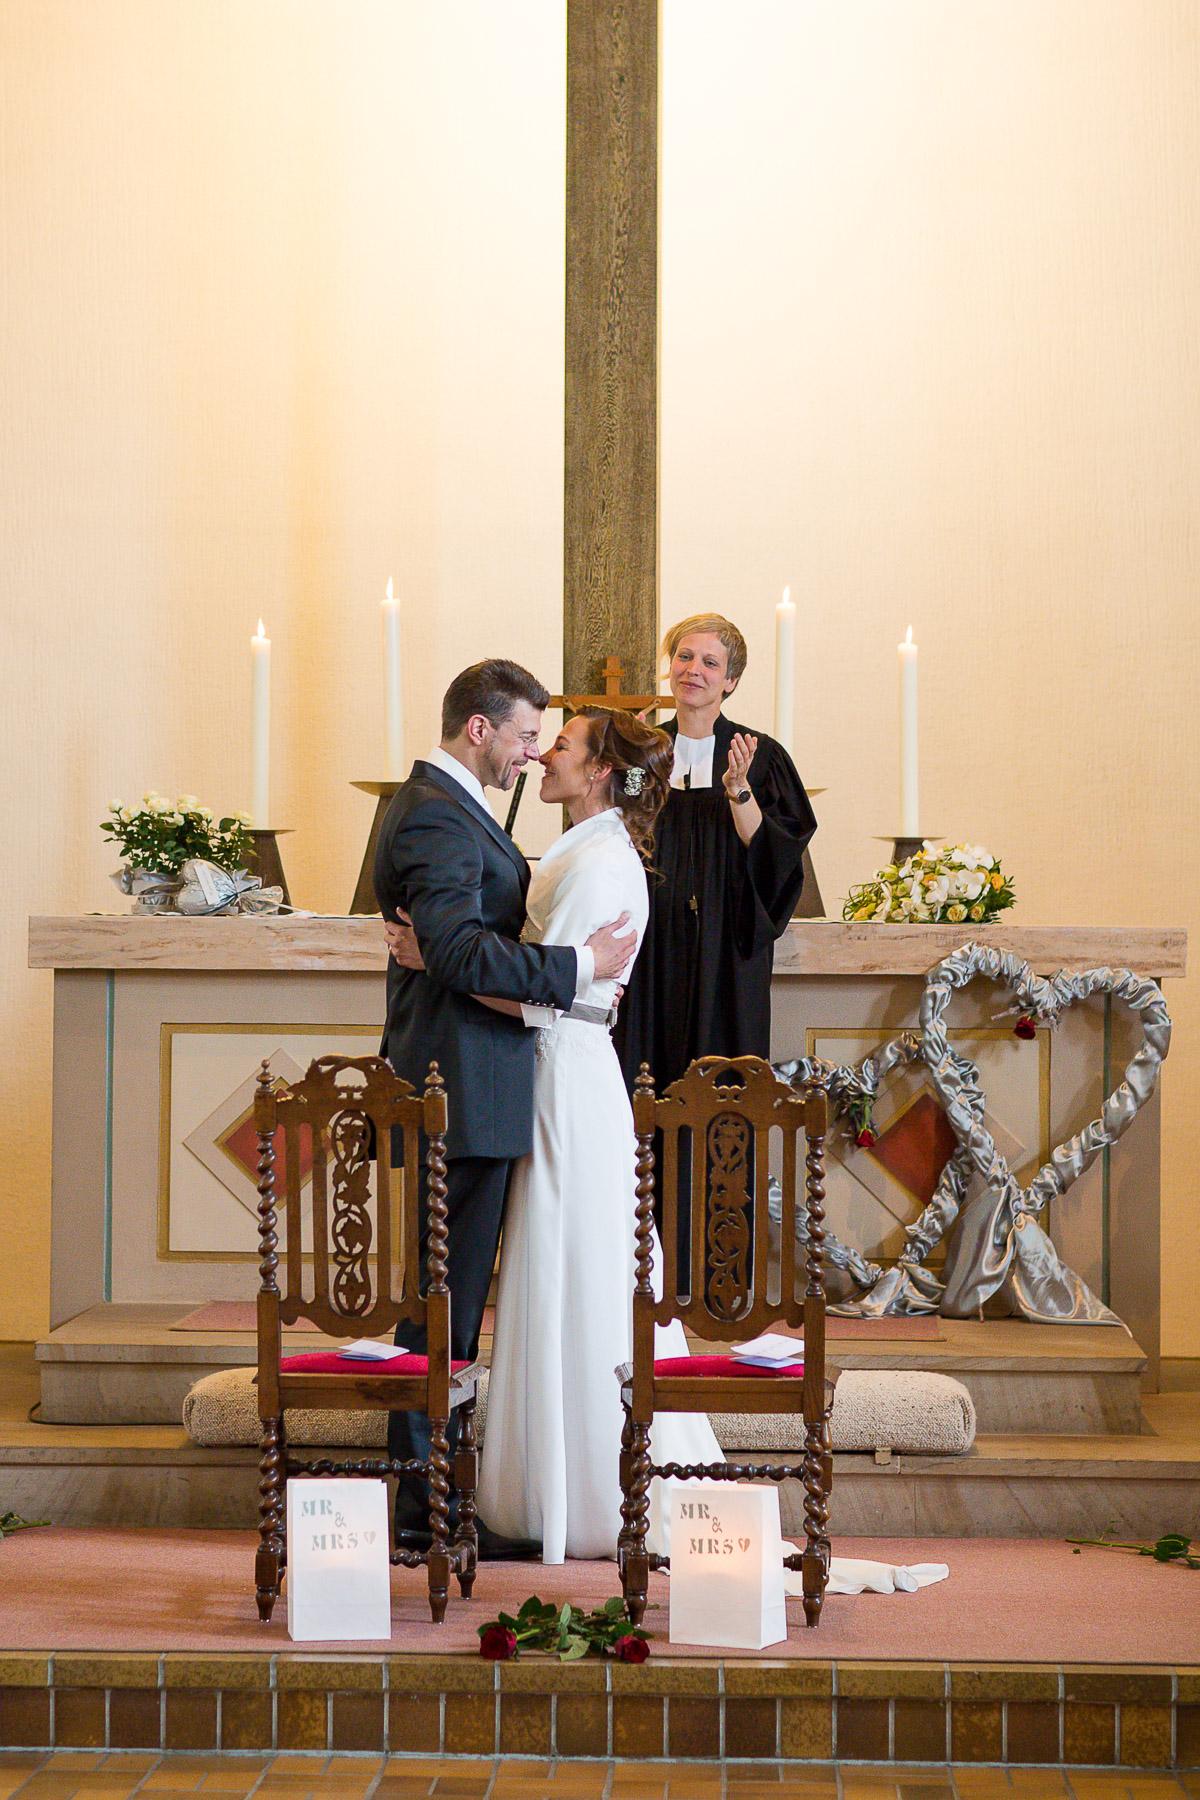 Hochzeitsfotograf-Bielefeld-2015-05-25